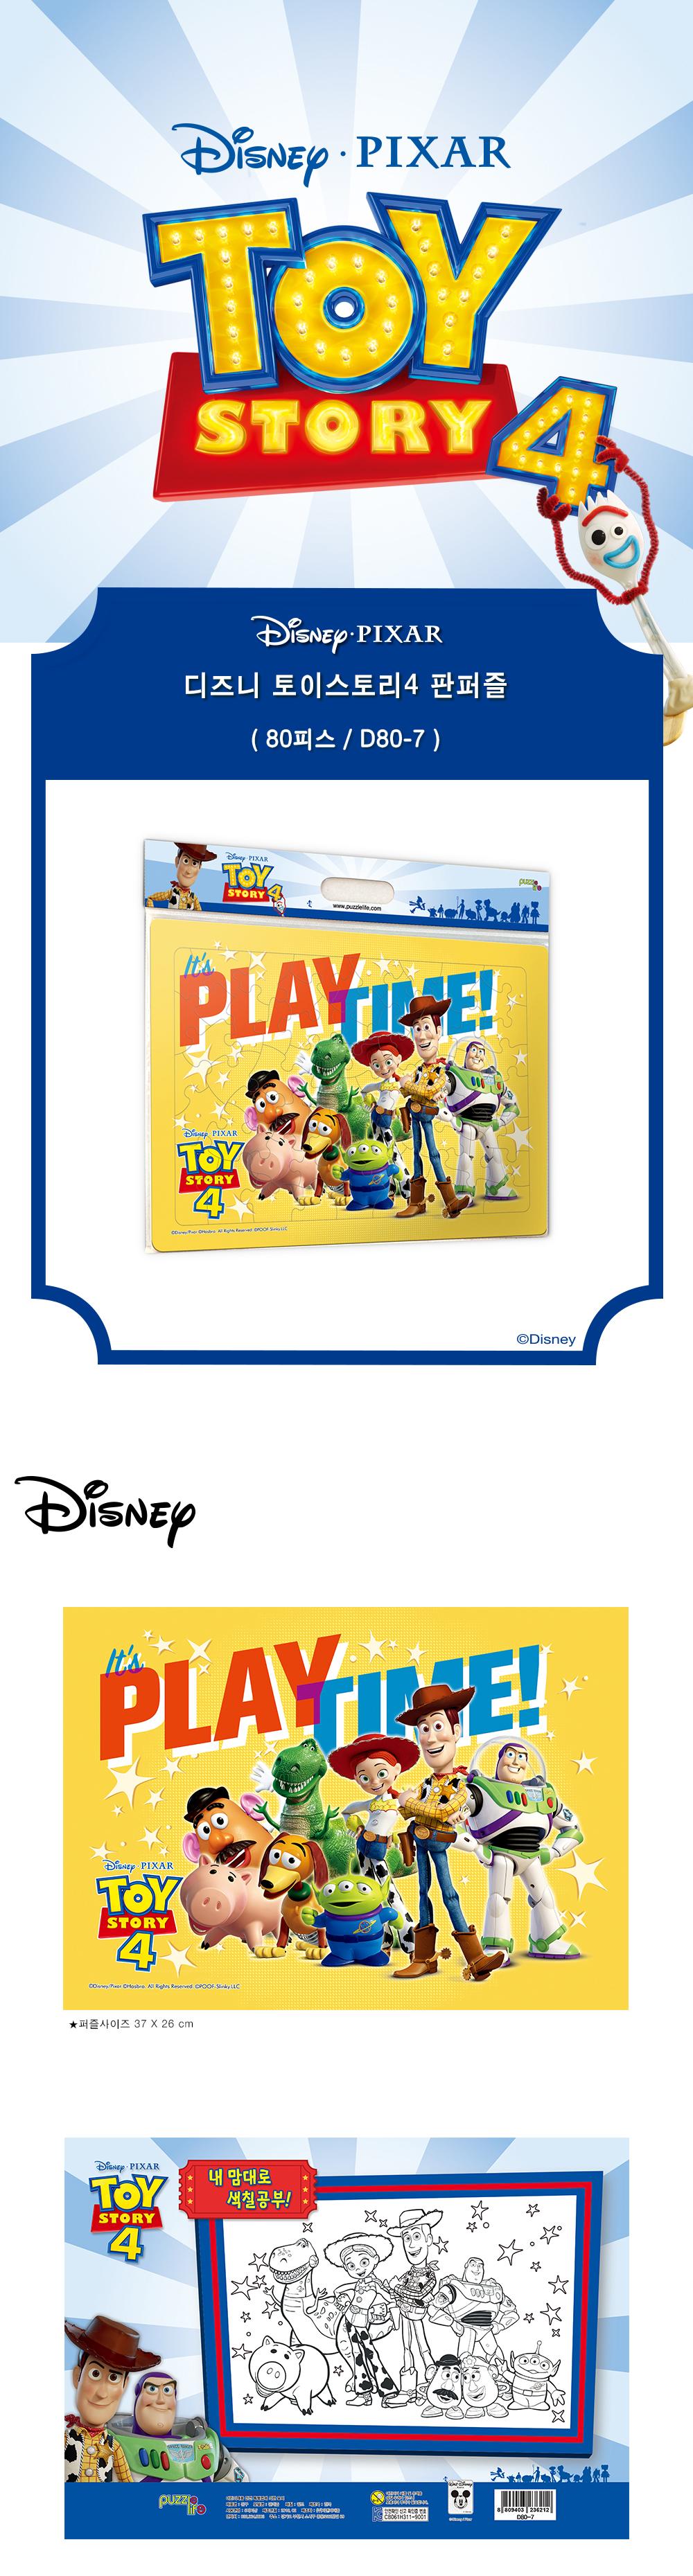 [Disney] 디즈니 토이스토리4 판퍼즐(80피스/D80-7) - 퍼즐라이프, 6,500원, 조각/퍼즐, 캐릭터 직소퍼즐